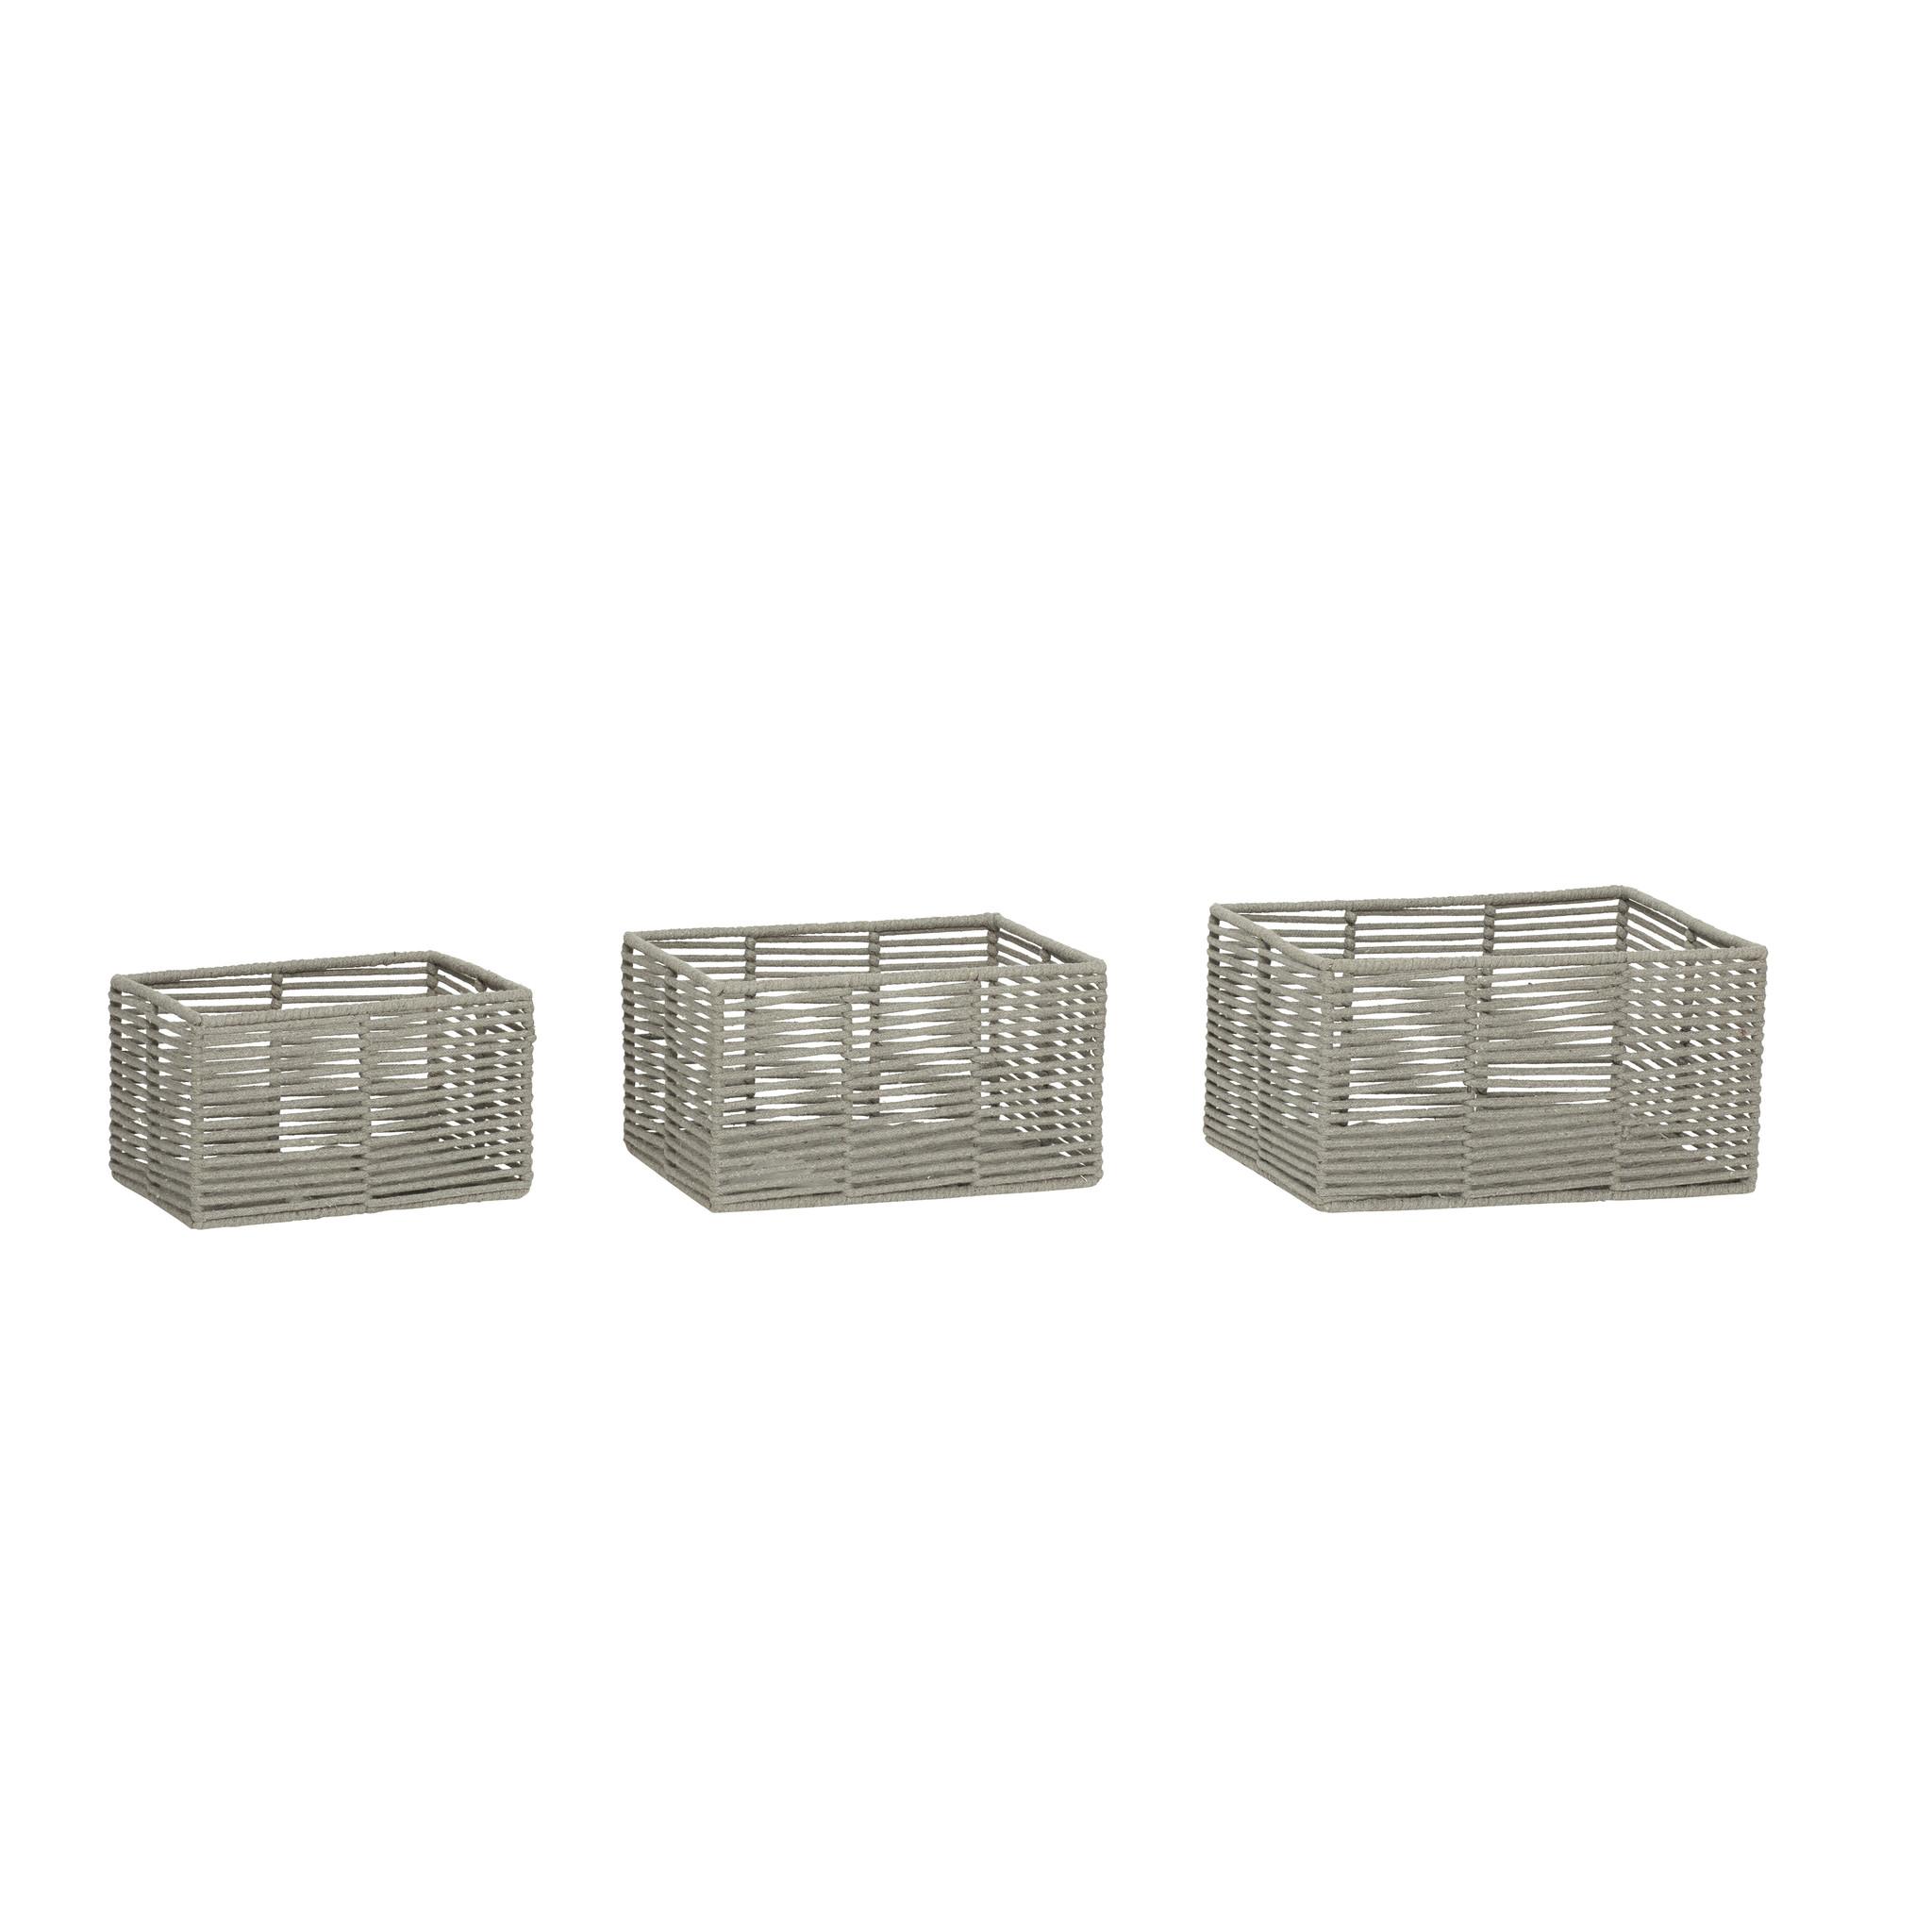 Hubsch Mand, vierkant, katoen, grijs, set van 3-410505-5712772062555